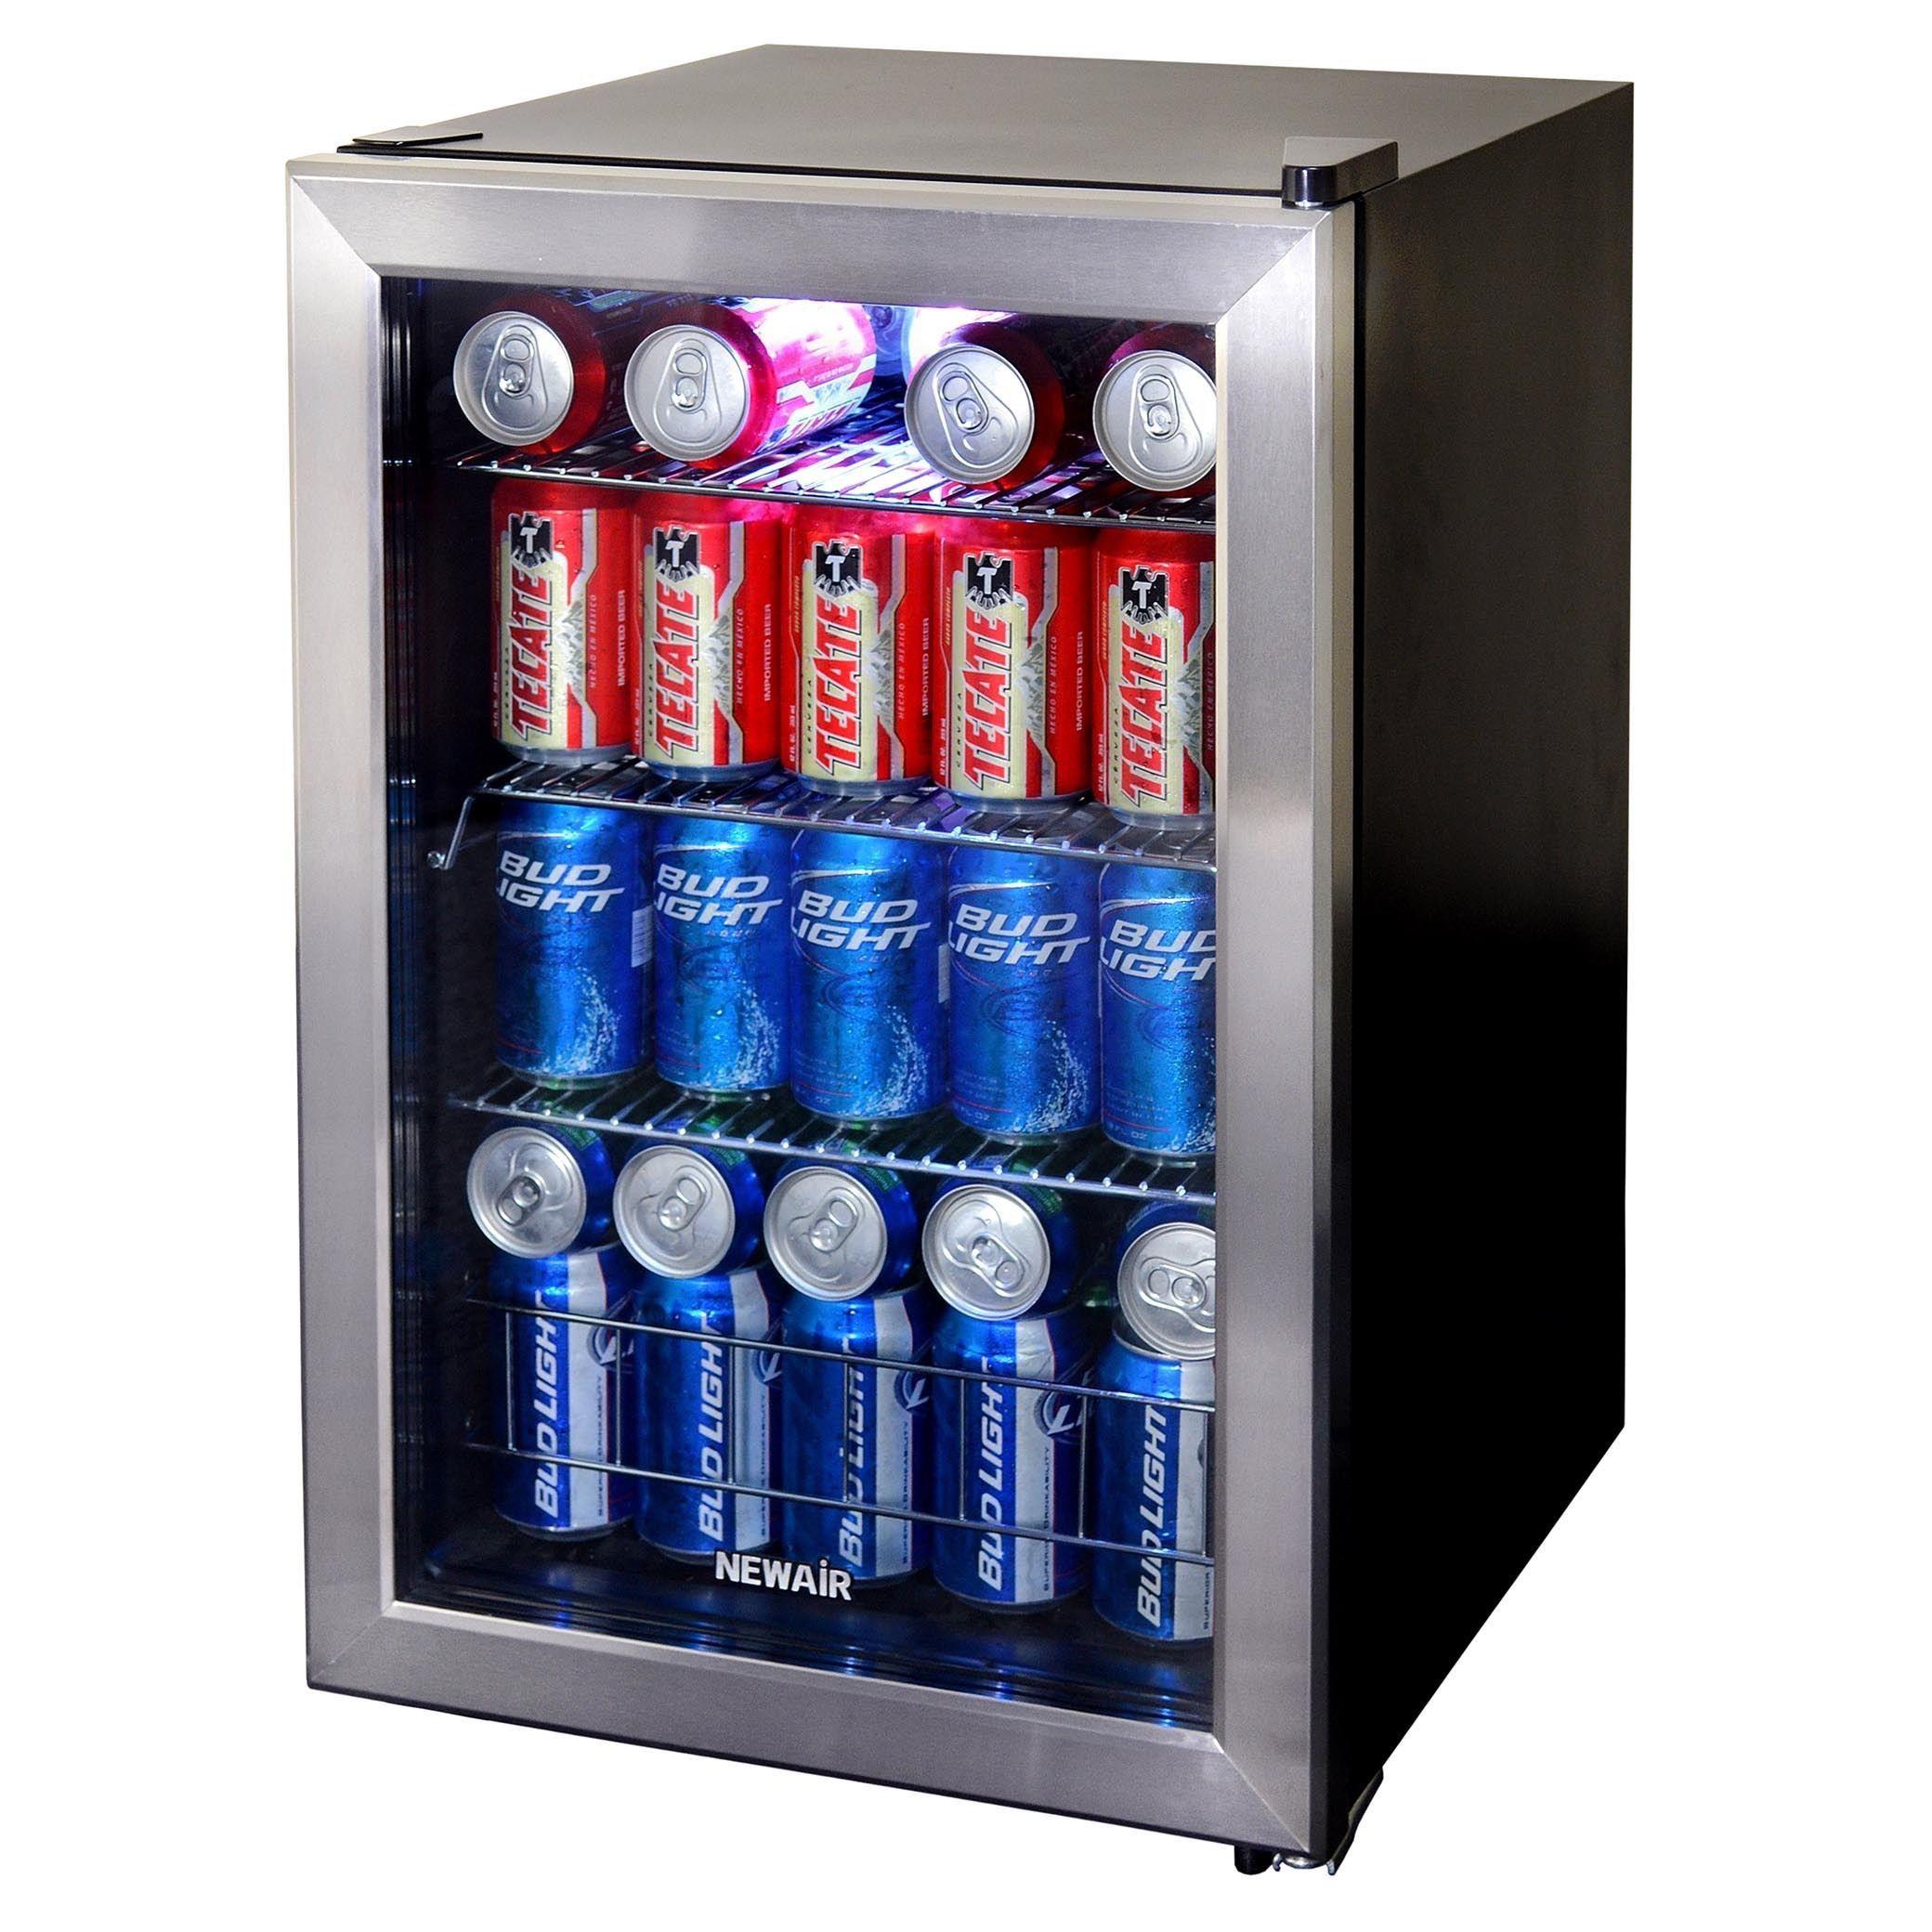 Sleek Appliance Garage: Newair Appliances Stainless Steel Beverage Cooler (84 Can